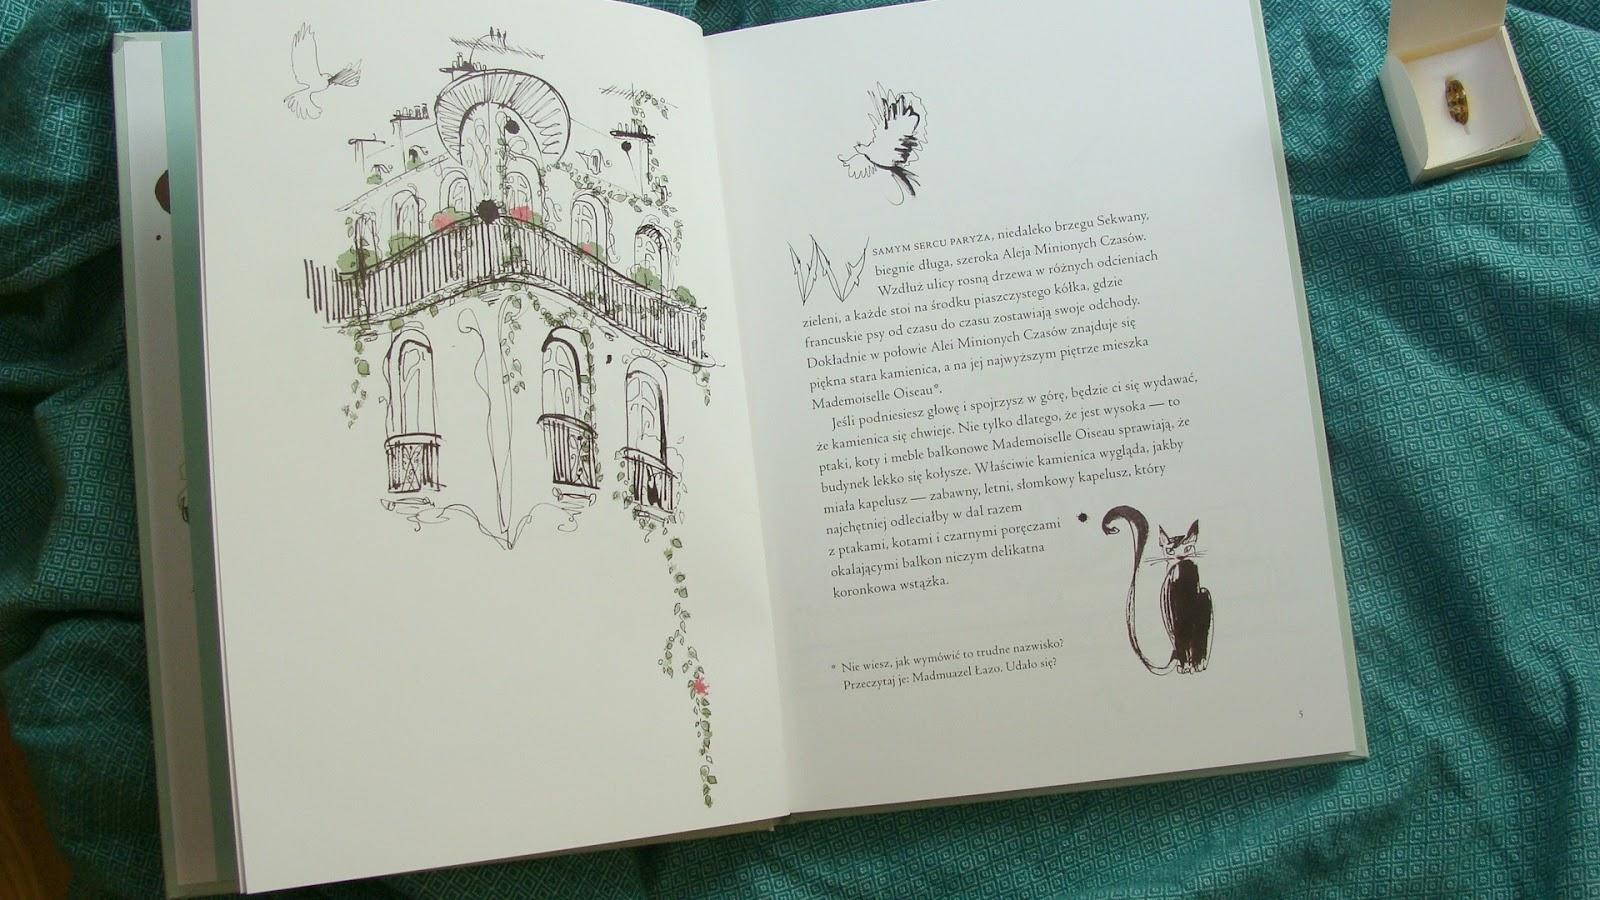 Historia Mademoiselle Oiseau, Kolor do Przytulania